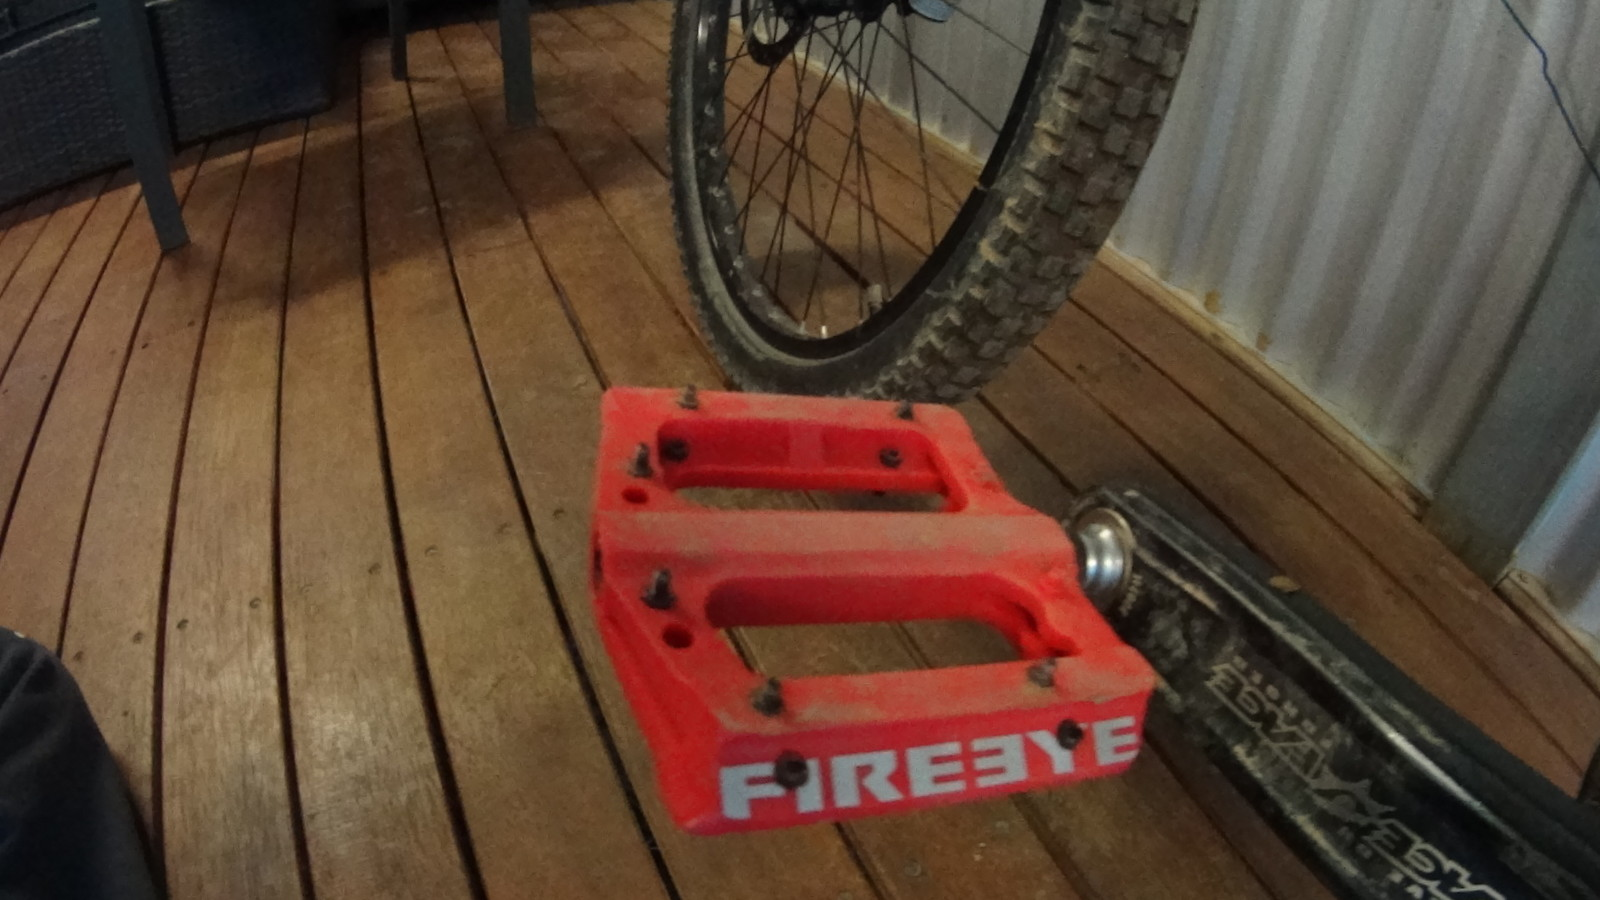 Fire eye pedals  - Thomas McGillivray - Mountain Biking Pictures - Vital MTB